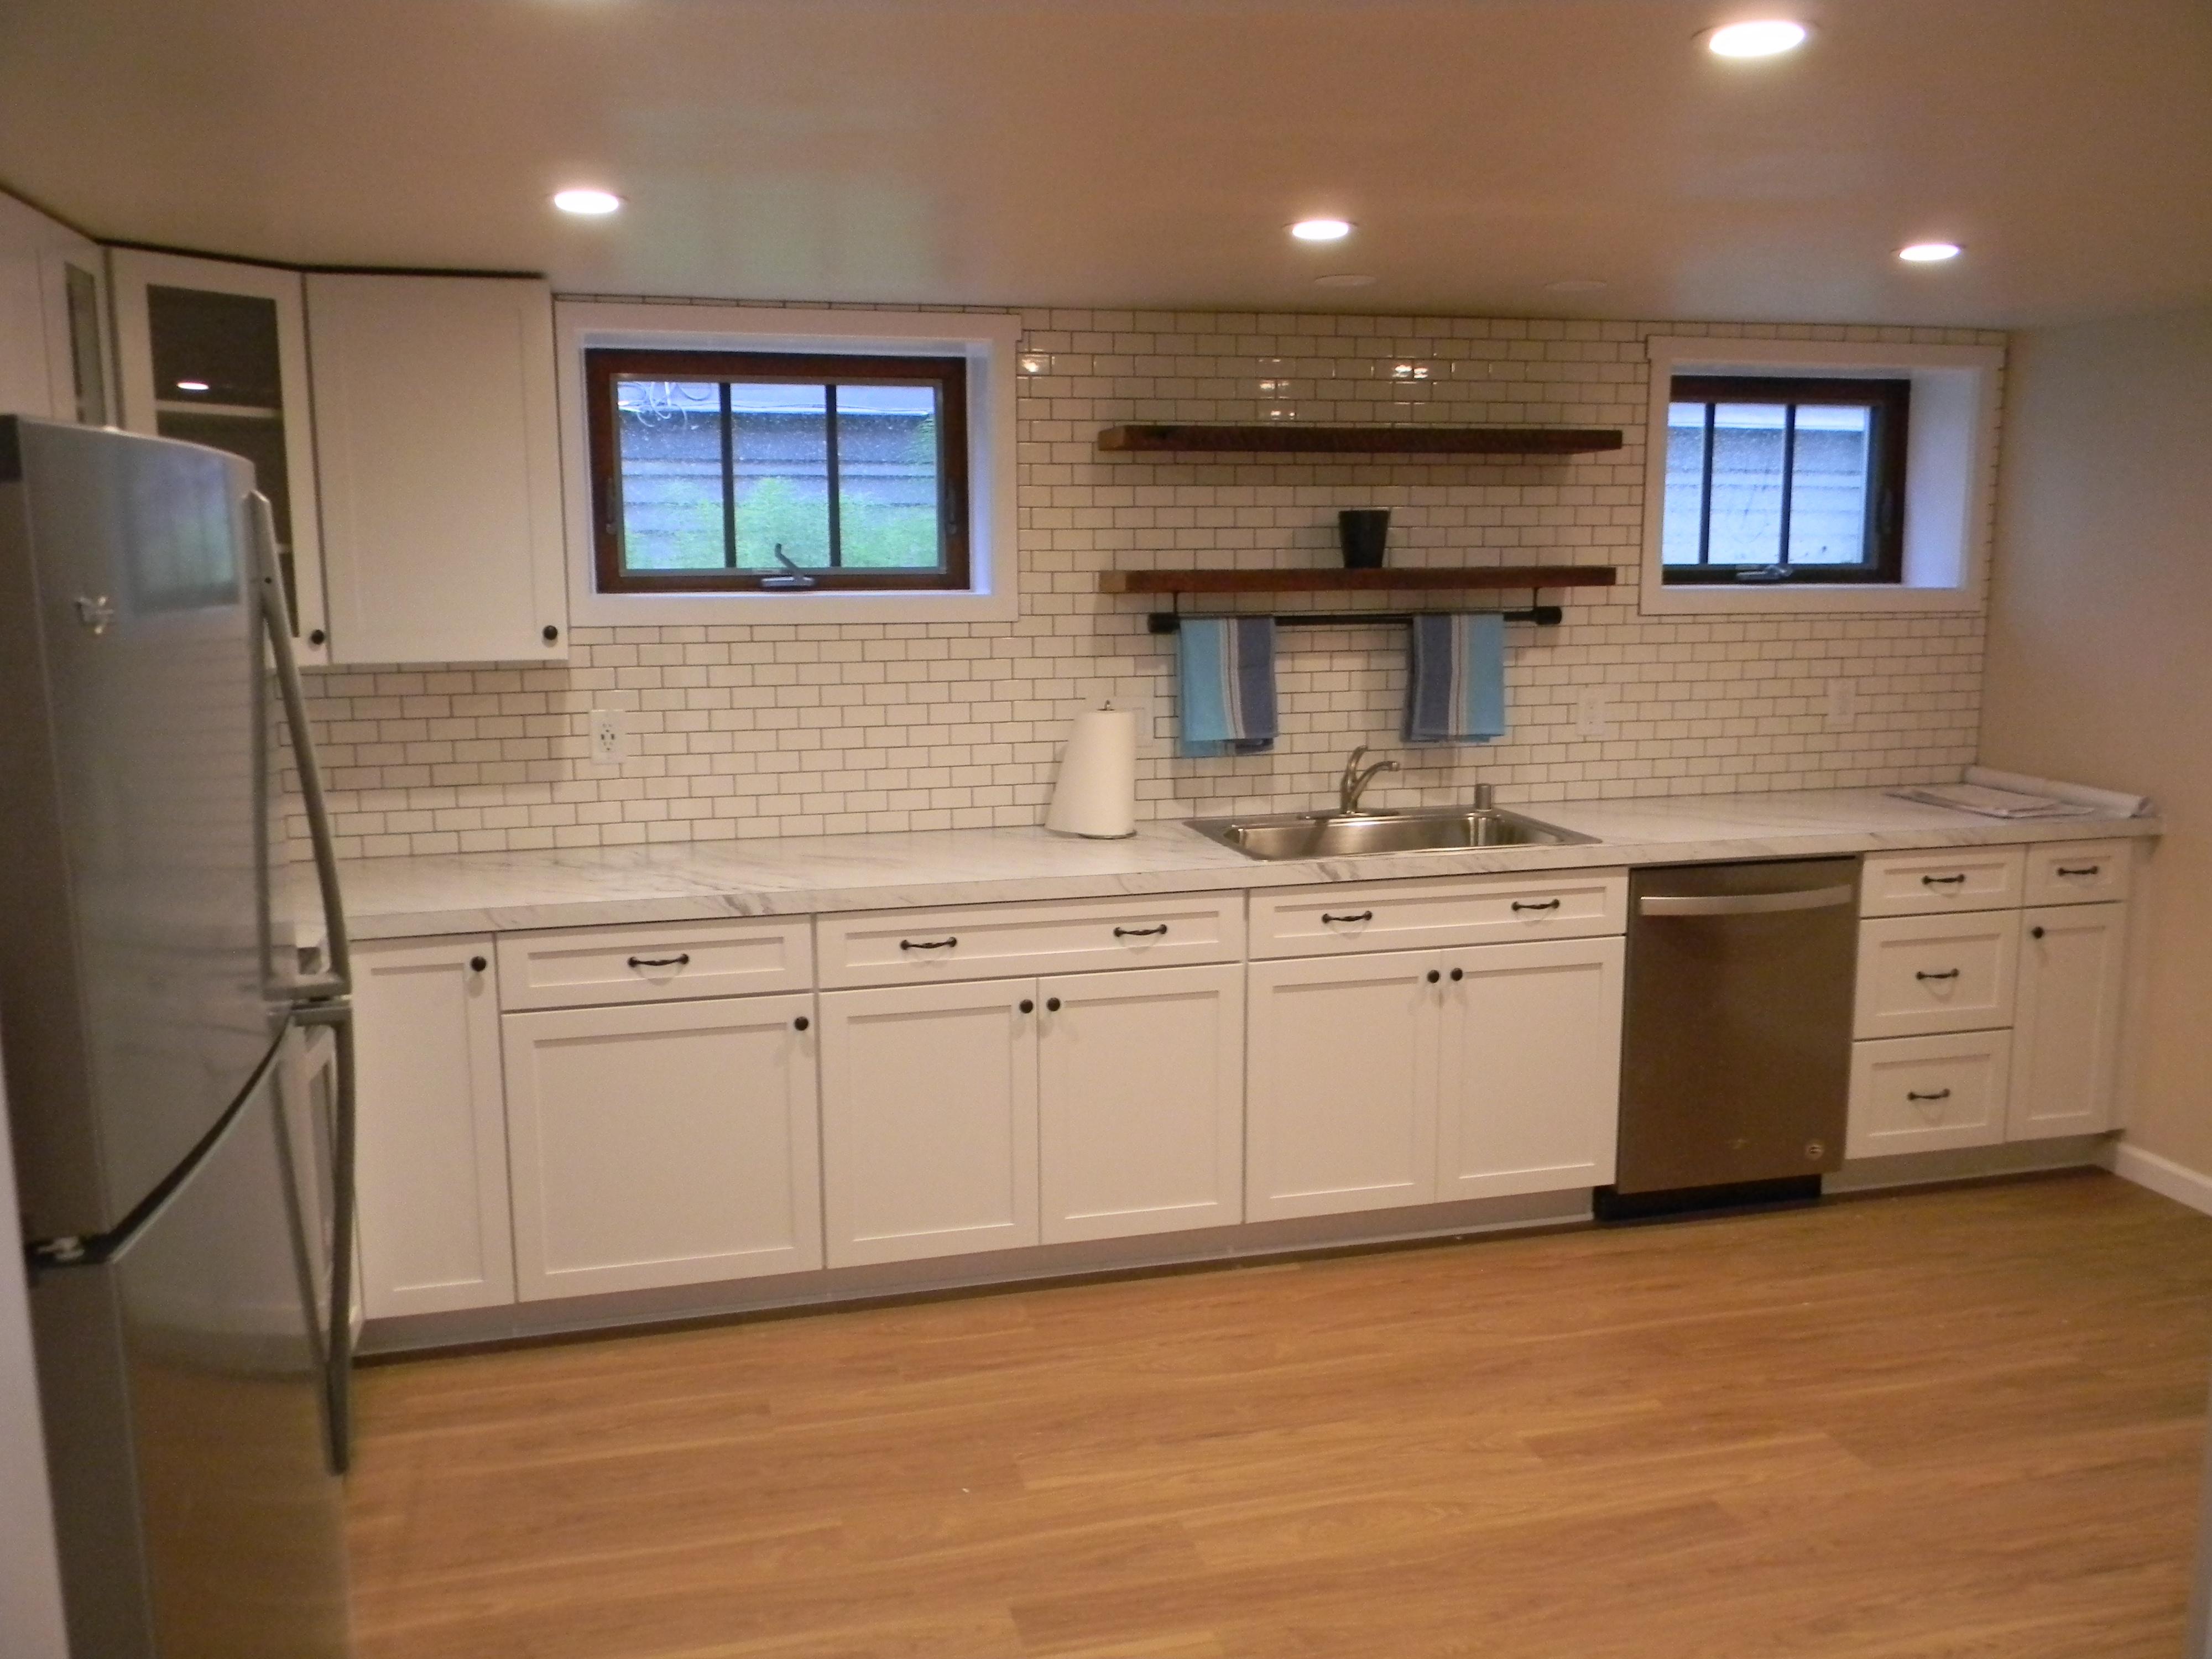 Ken Baune Homes and Remodel image 3